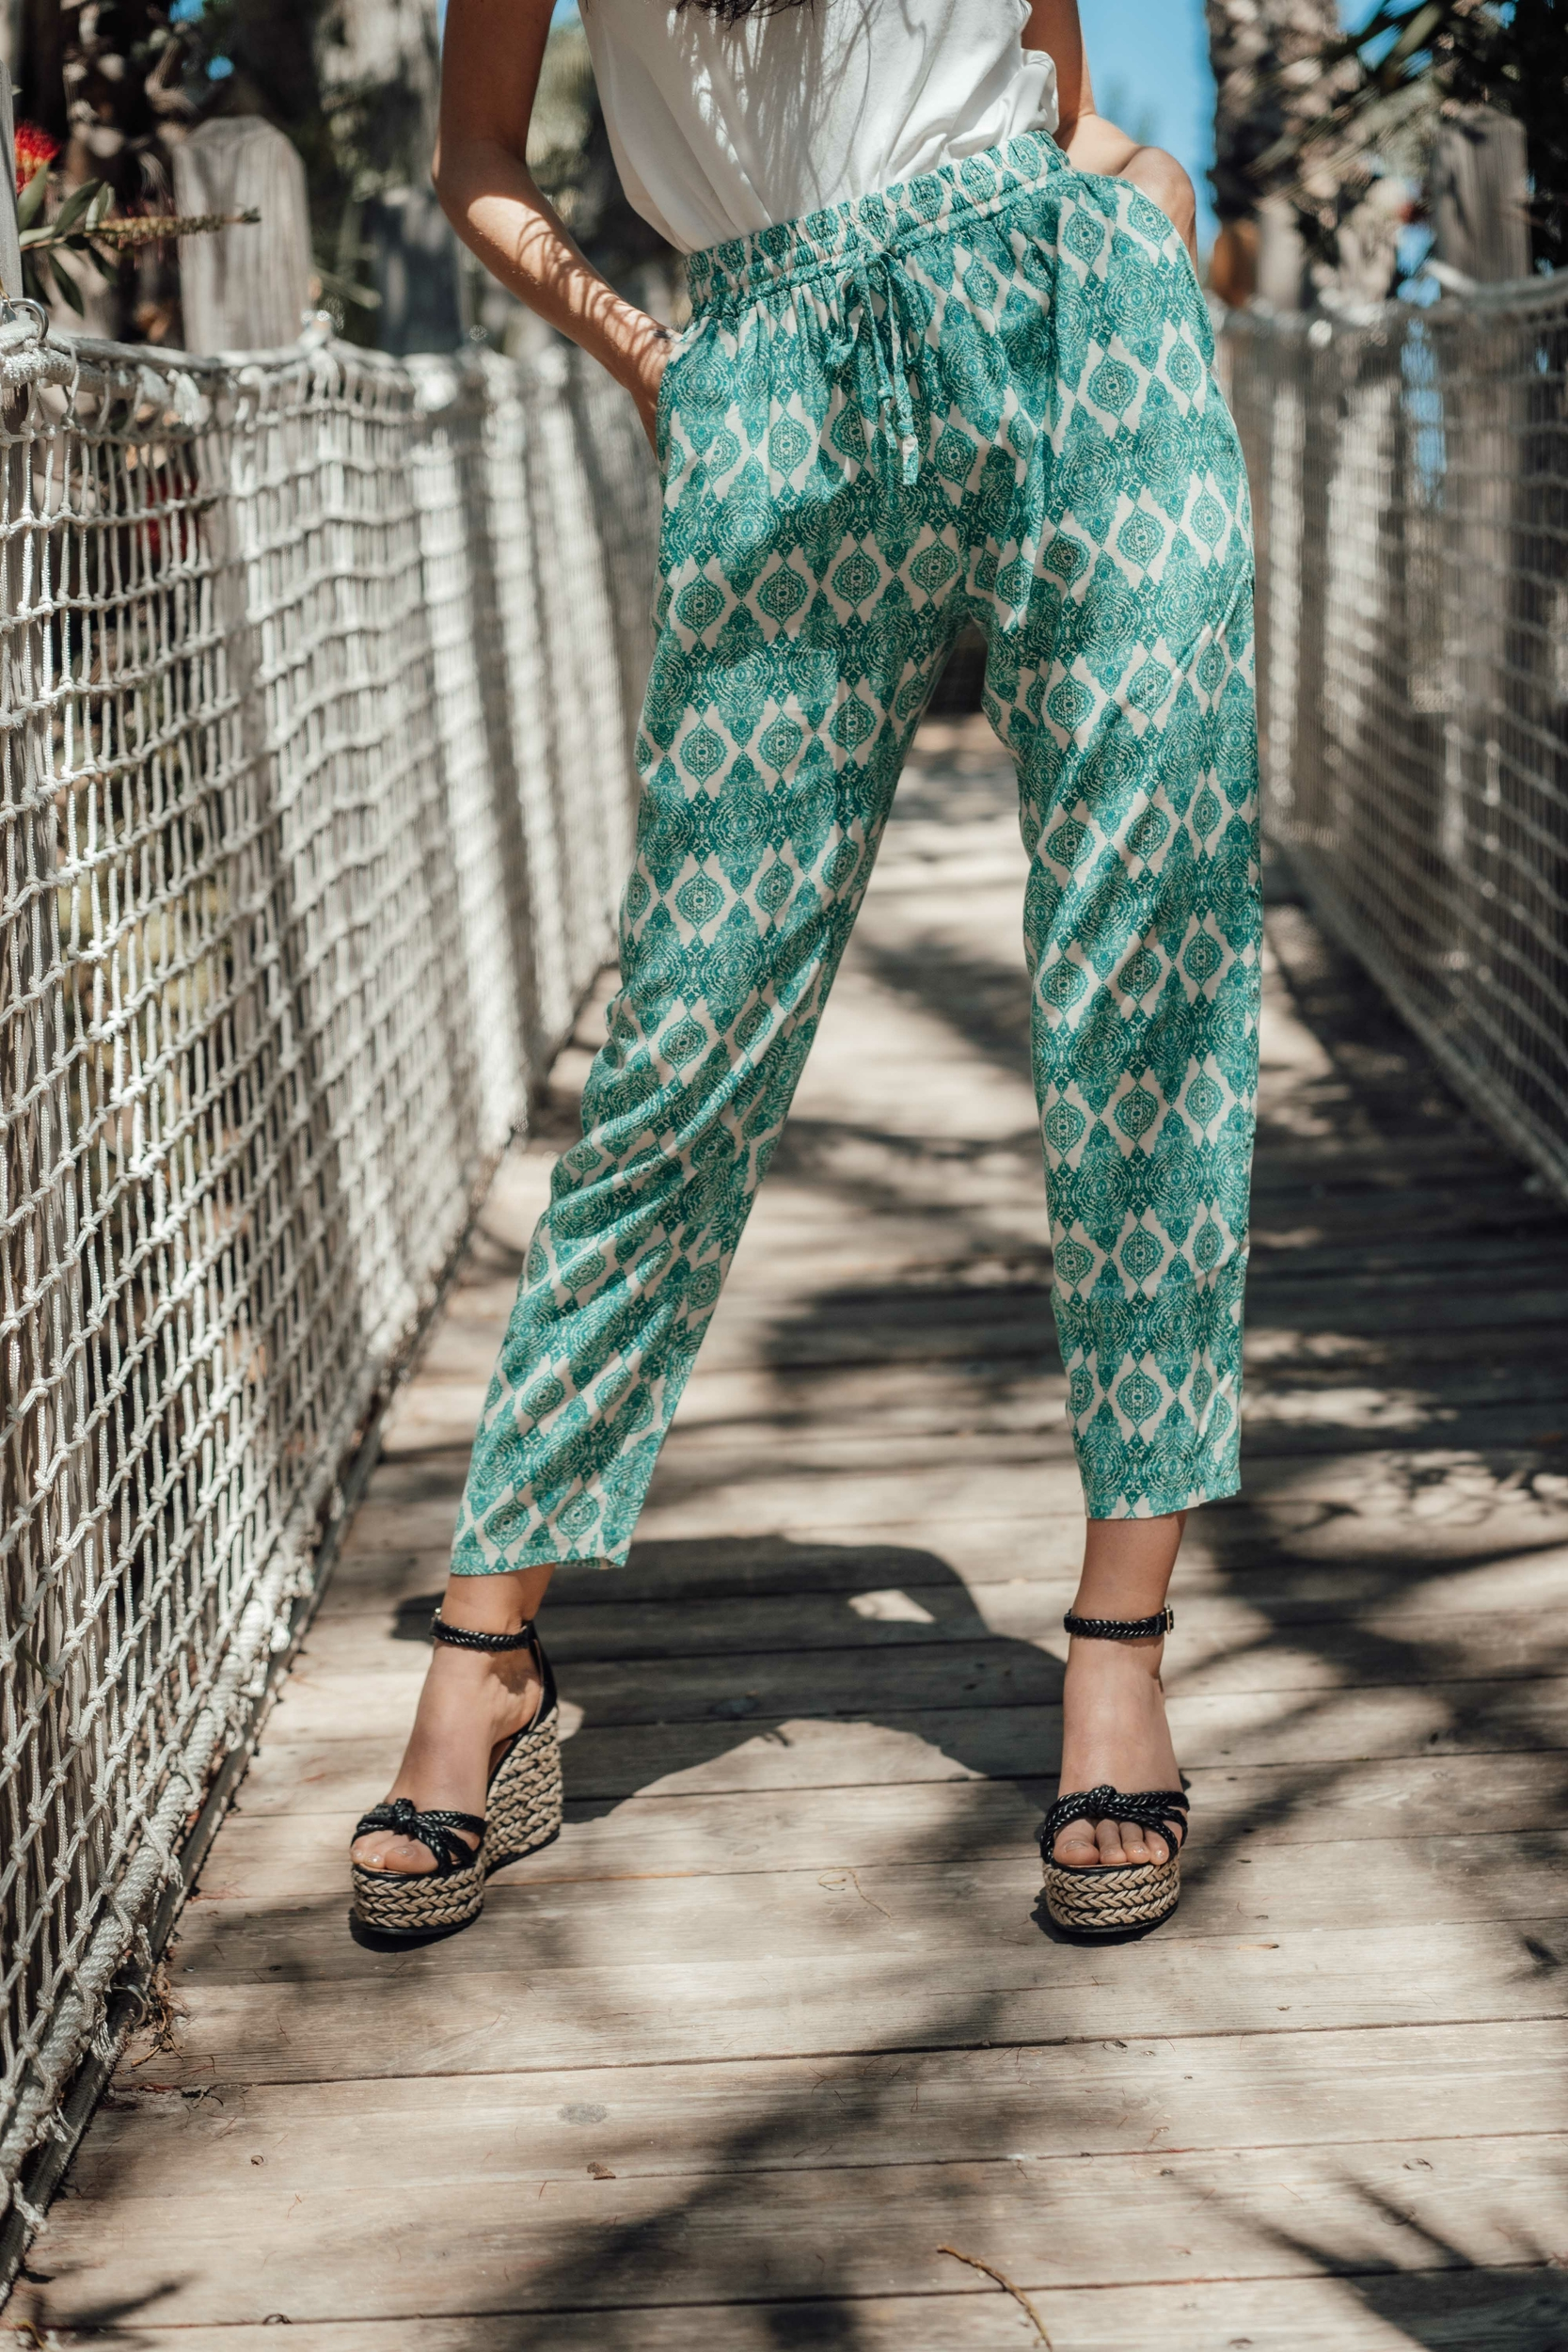 pantalon_desiré_turquoise_banditasPM-137